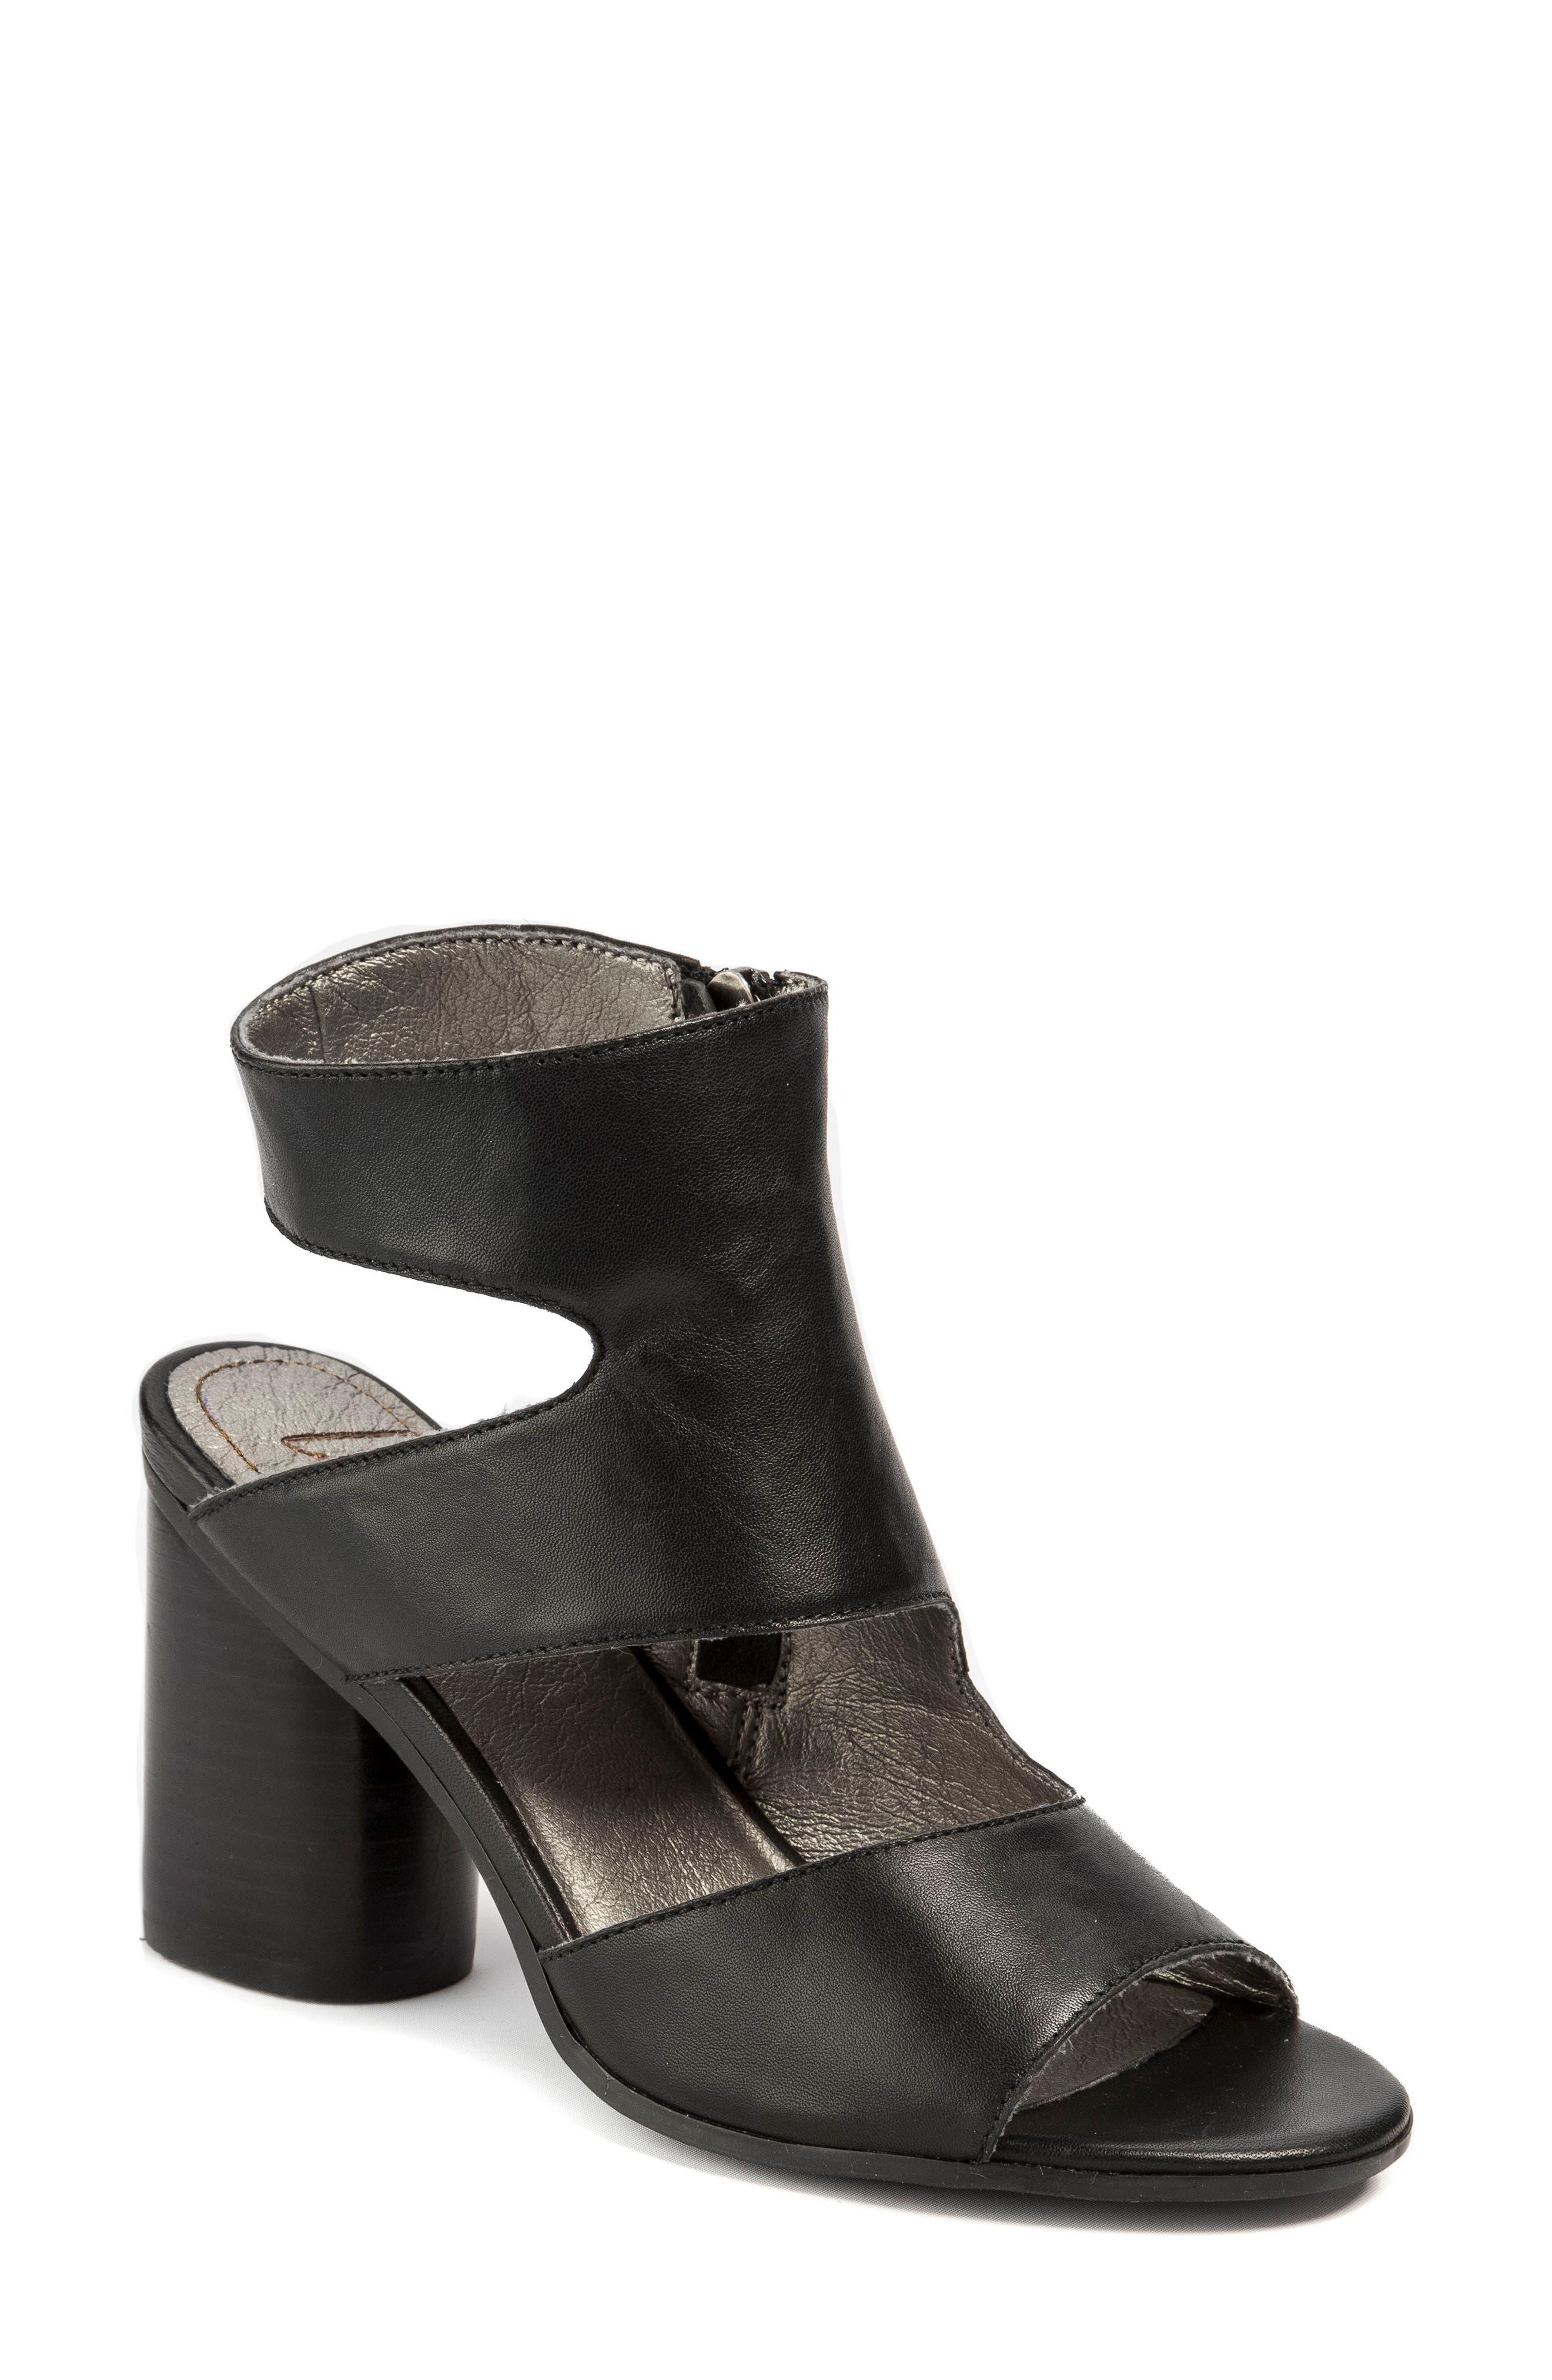 Hadie Asymmetrical Tall Sandal,                         Main,                         color, Black Leather